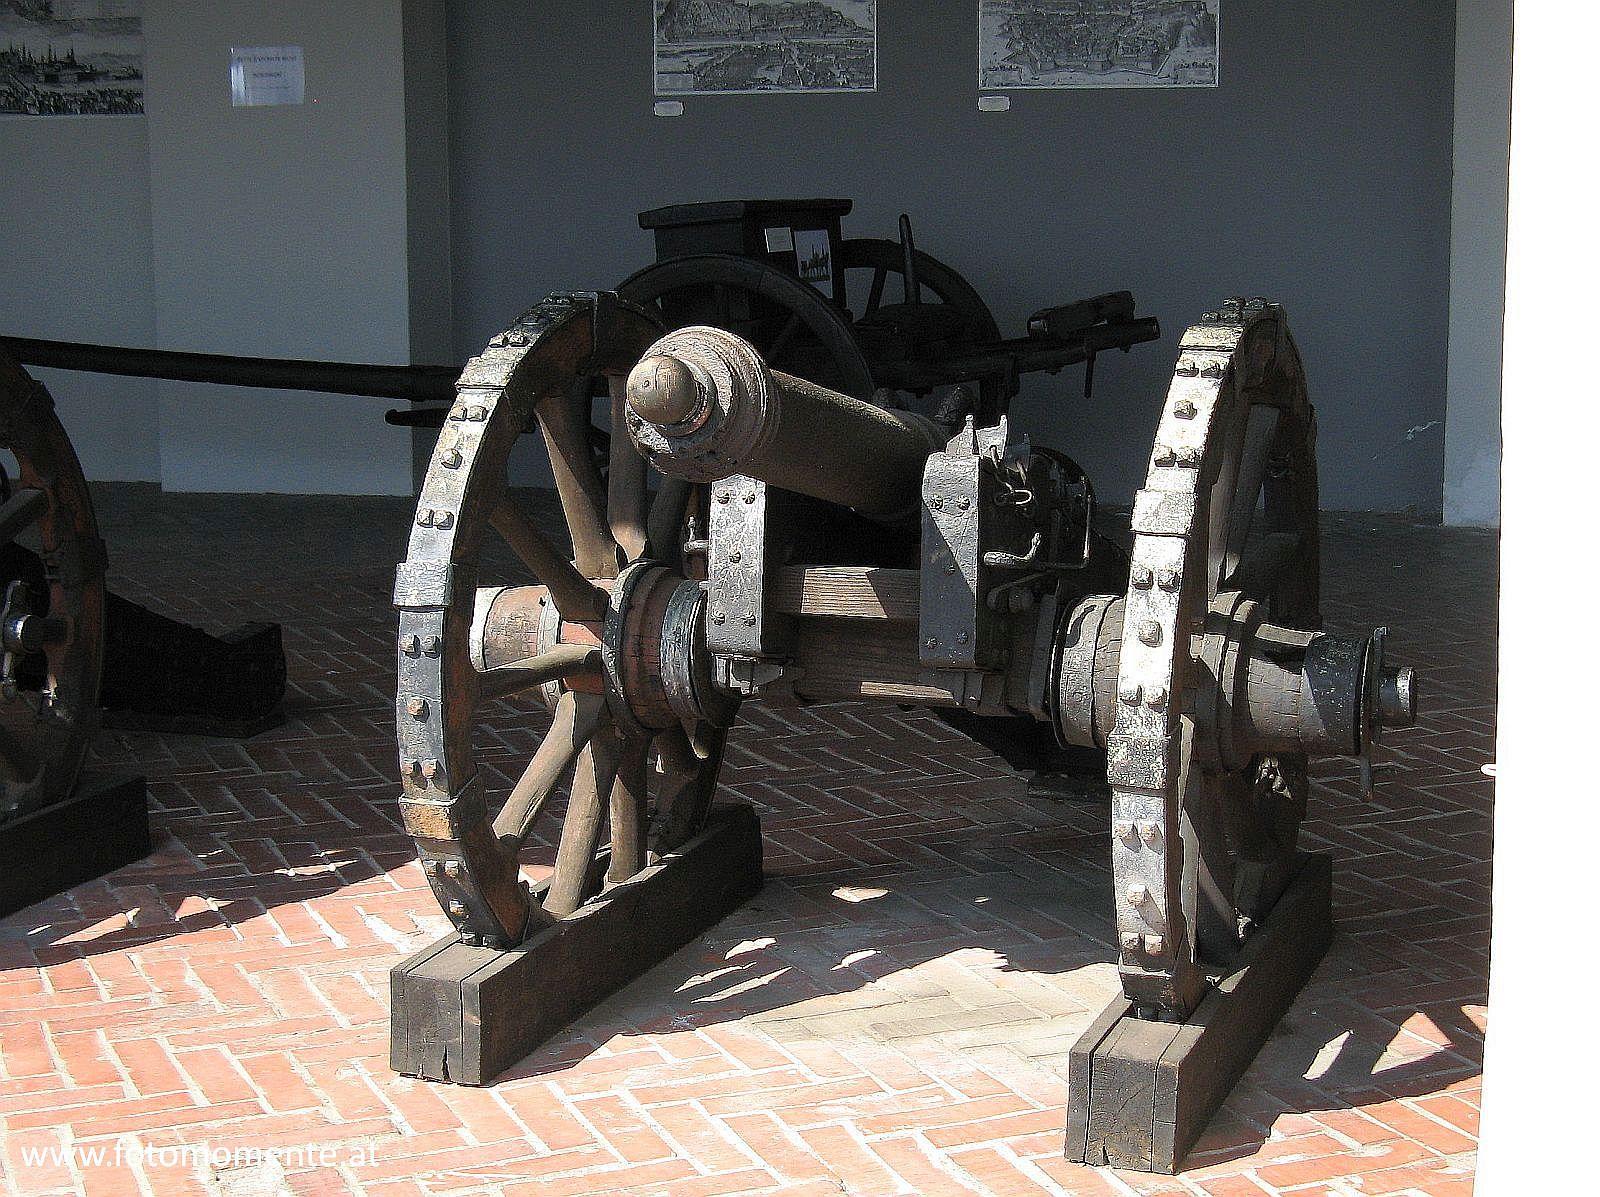 kanone kanonenhuette garnisionsmuseum schlossberg - Kanone neben dem Garnisionsmuseum - Grazer Schlossberg